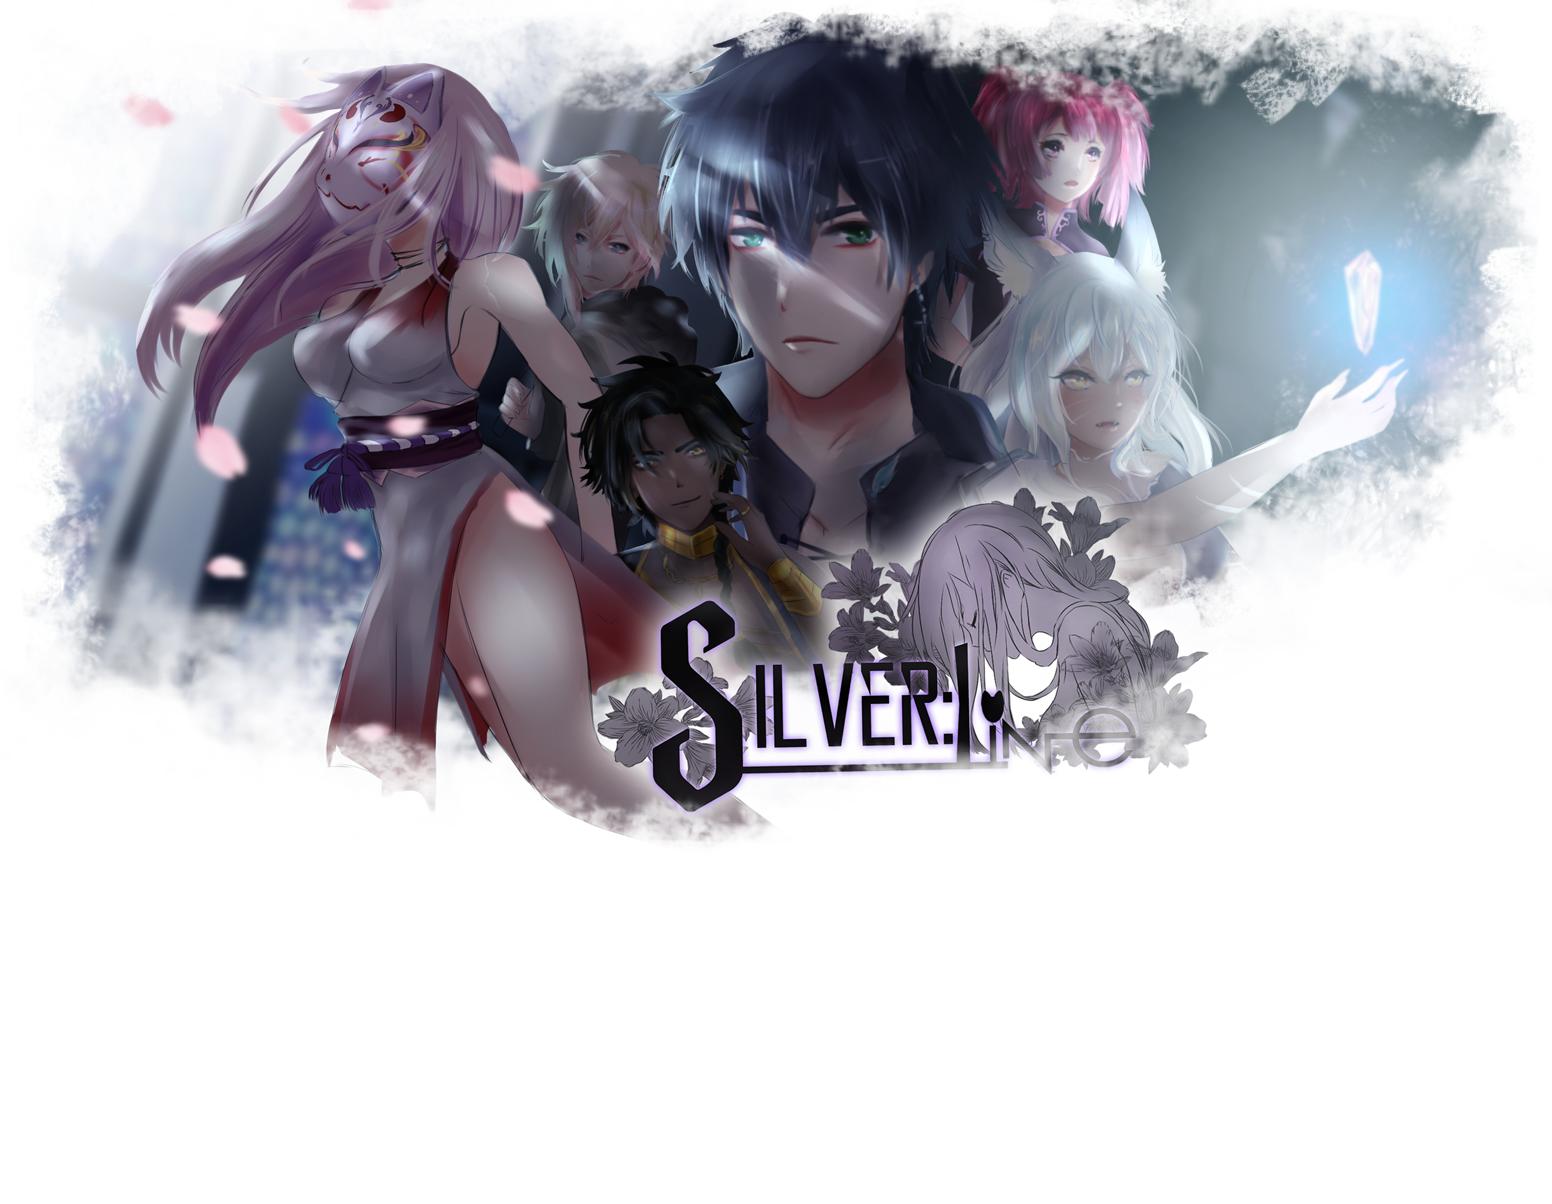 Silver:Line - On Kickstarter